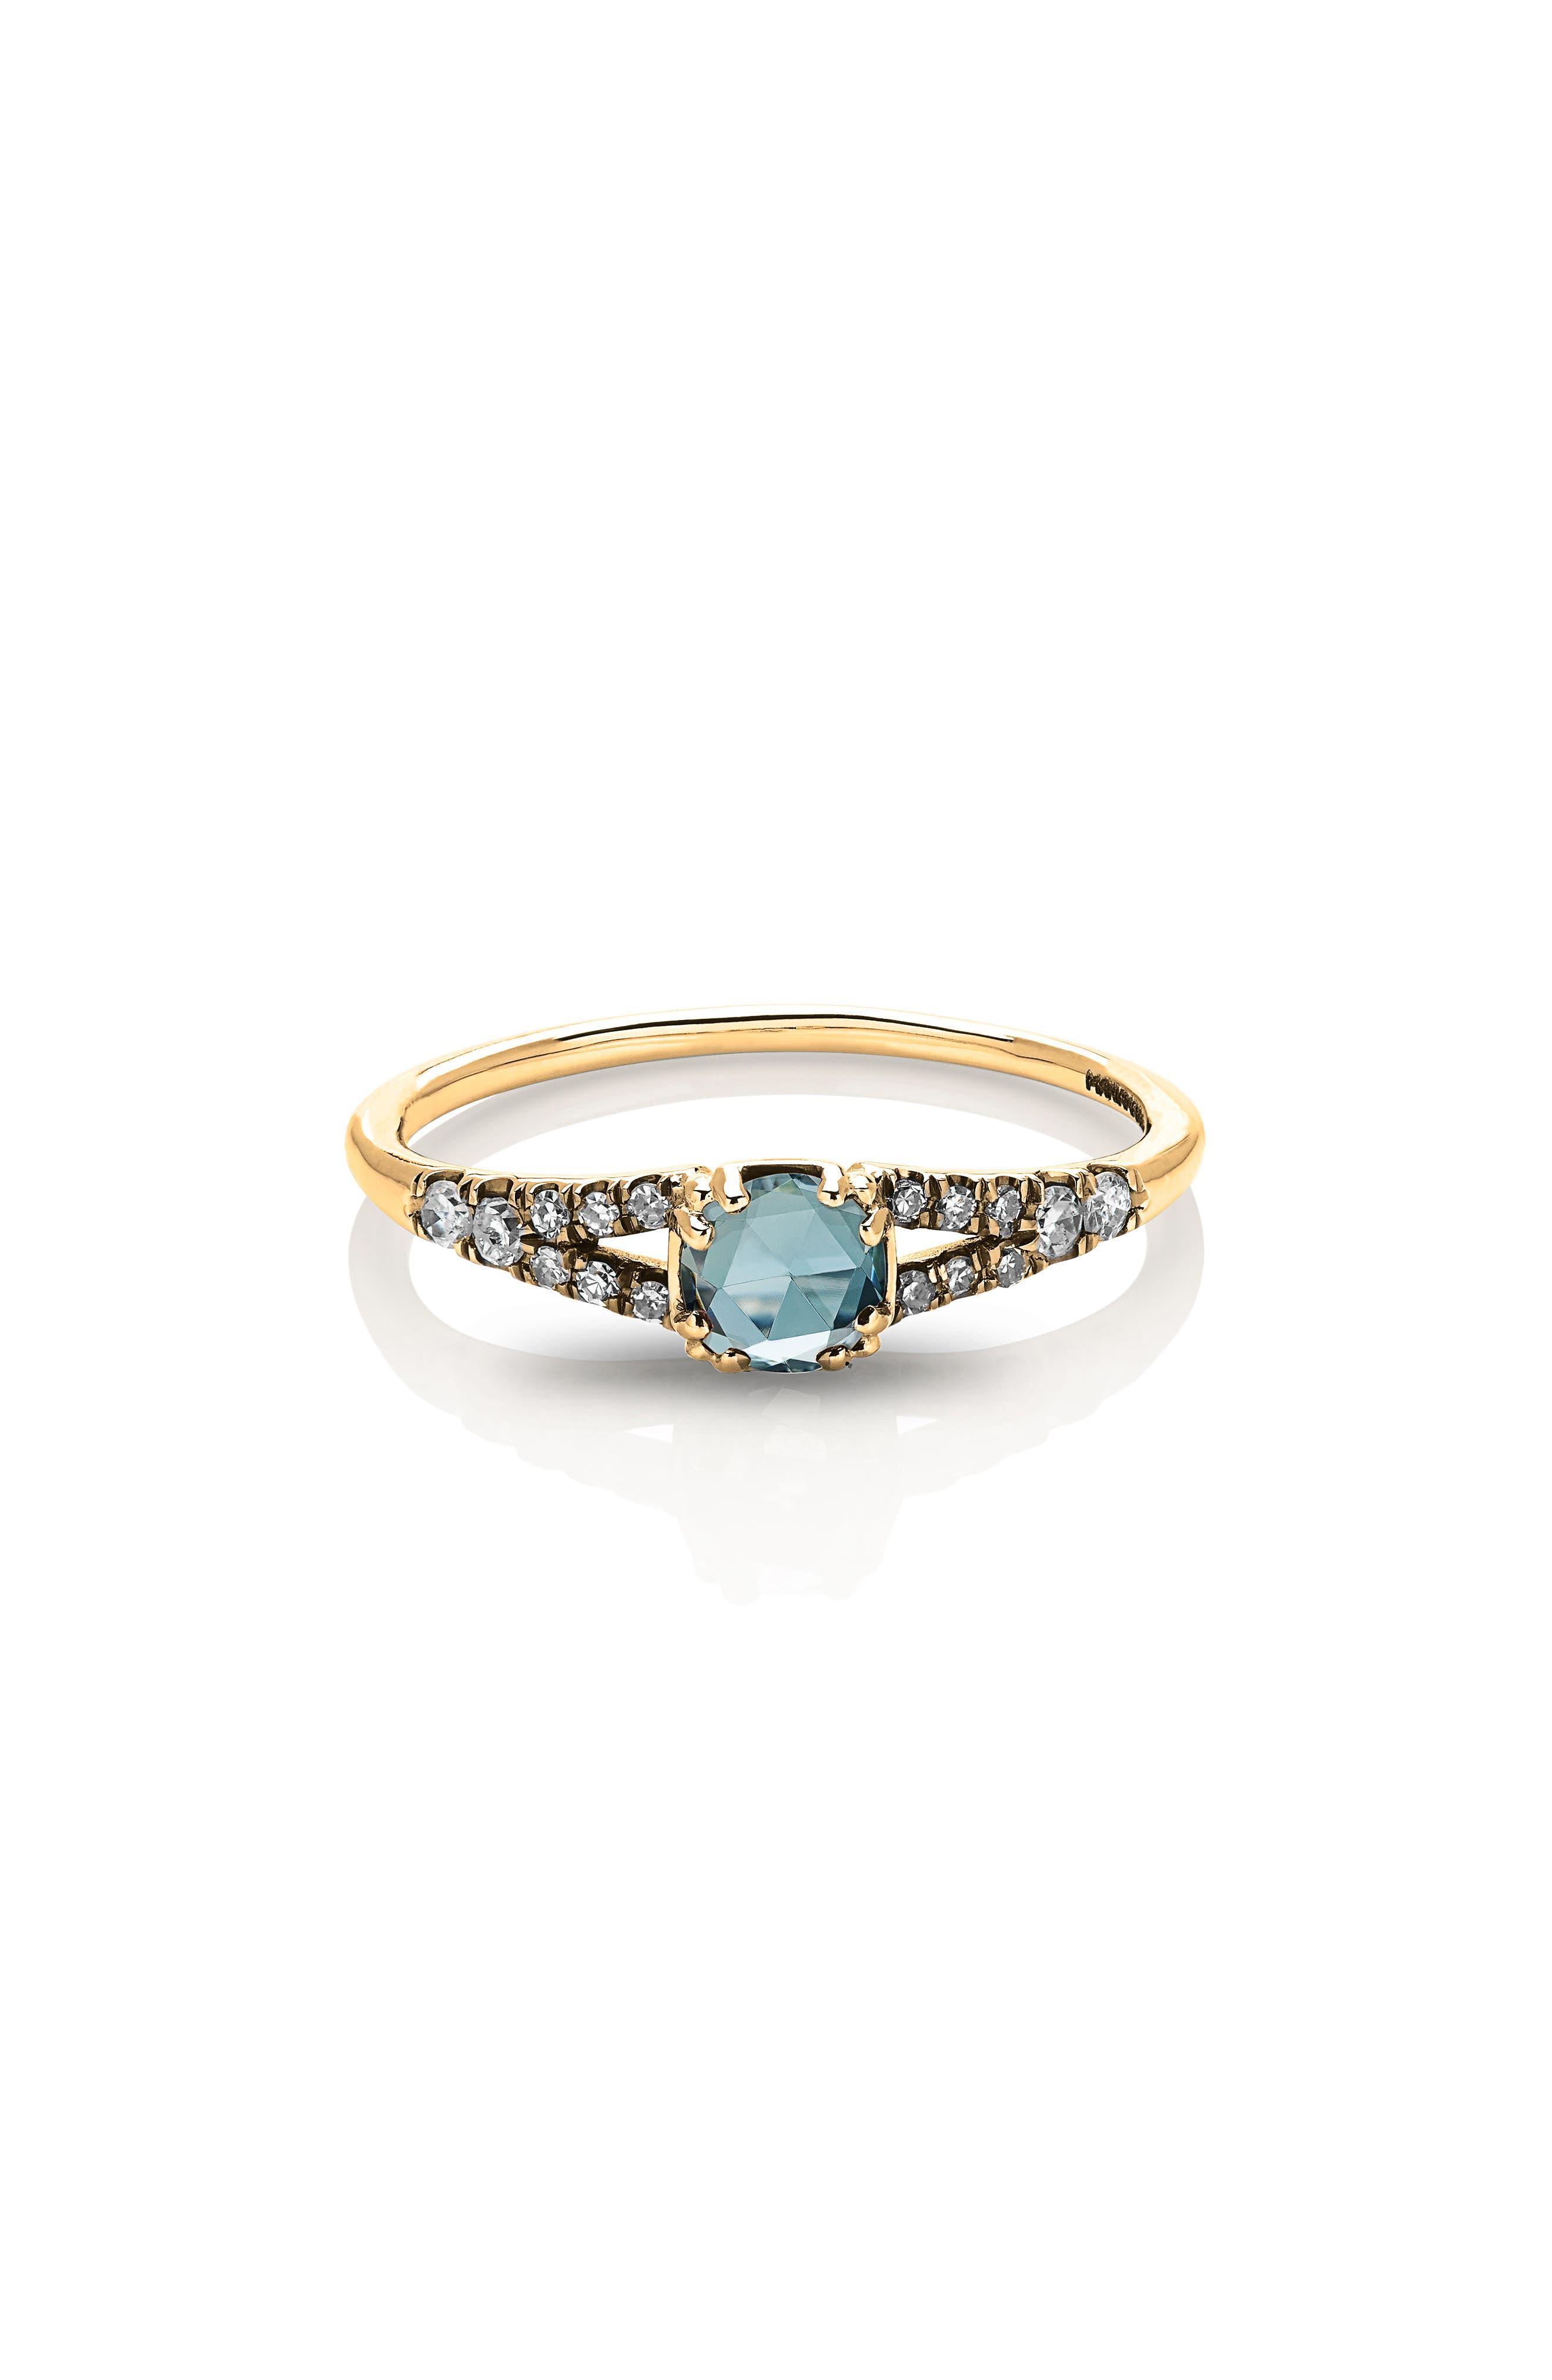 Devotion Solitaire Diamond Ring,                             Main thumbnail 1, color,                             YELLOW GOLD/ AQUAMARINE